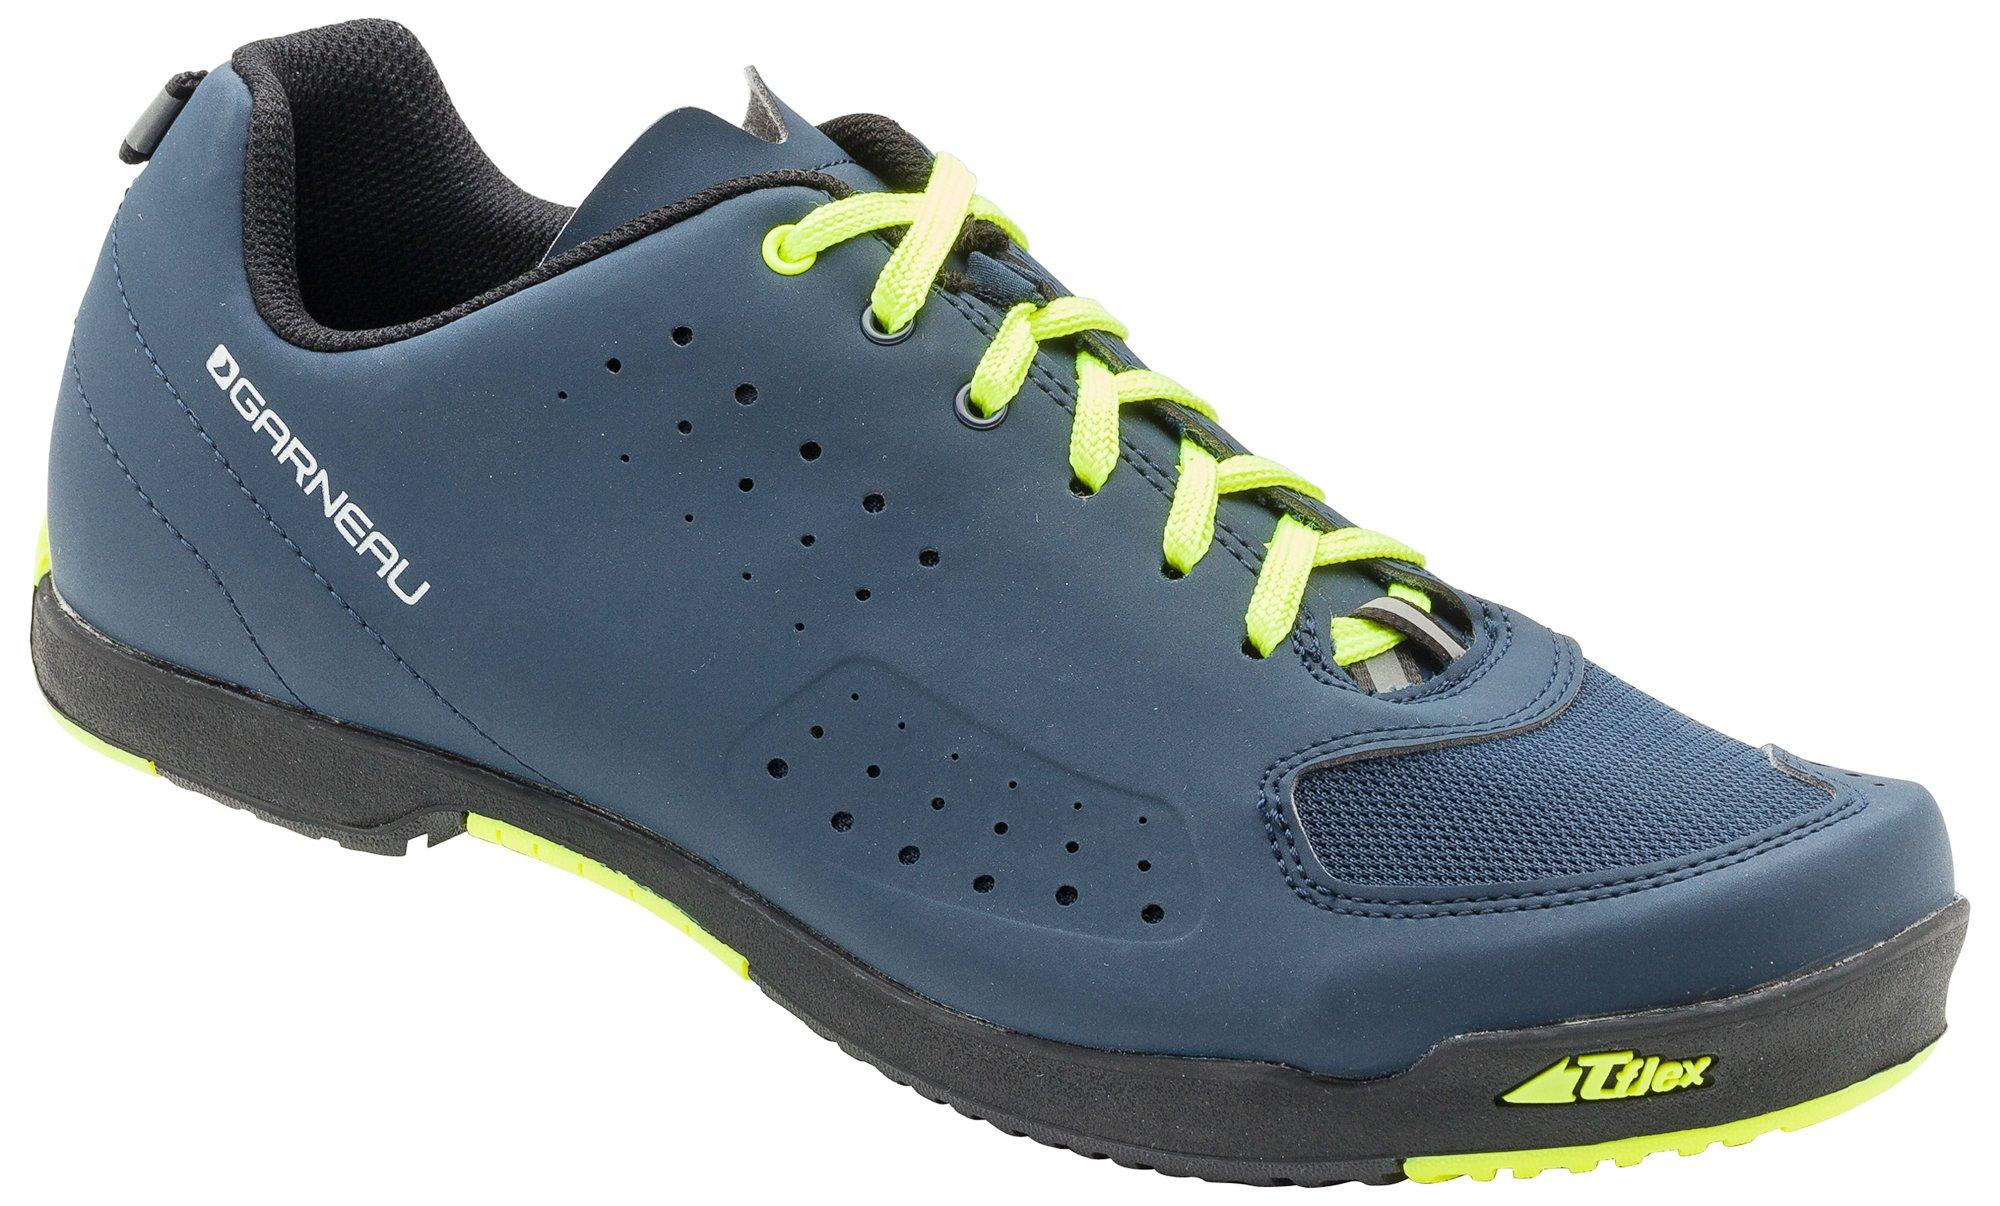 Louis Garneau - Urban Bike Shoes, Dark Night/Sulphur Spring, US (10.75), EU (45)